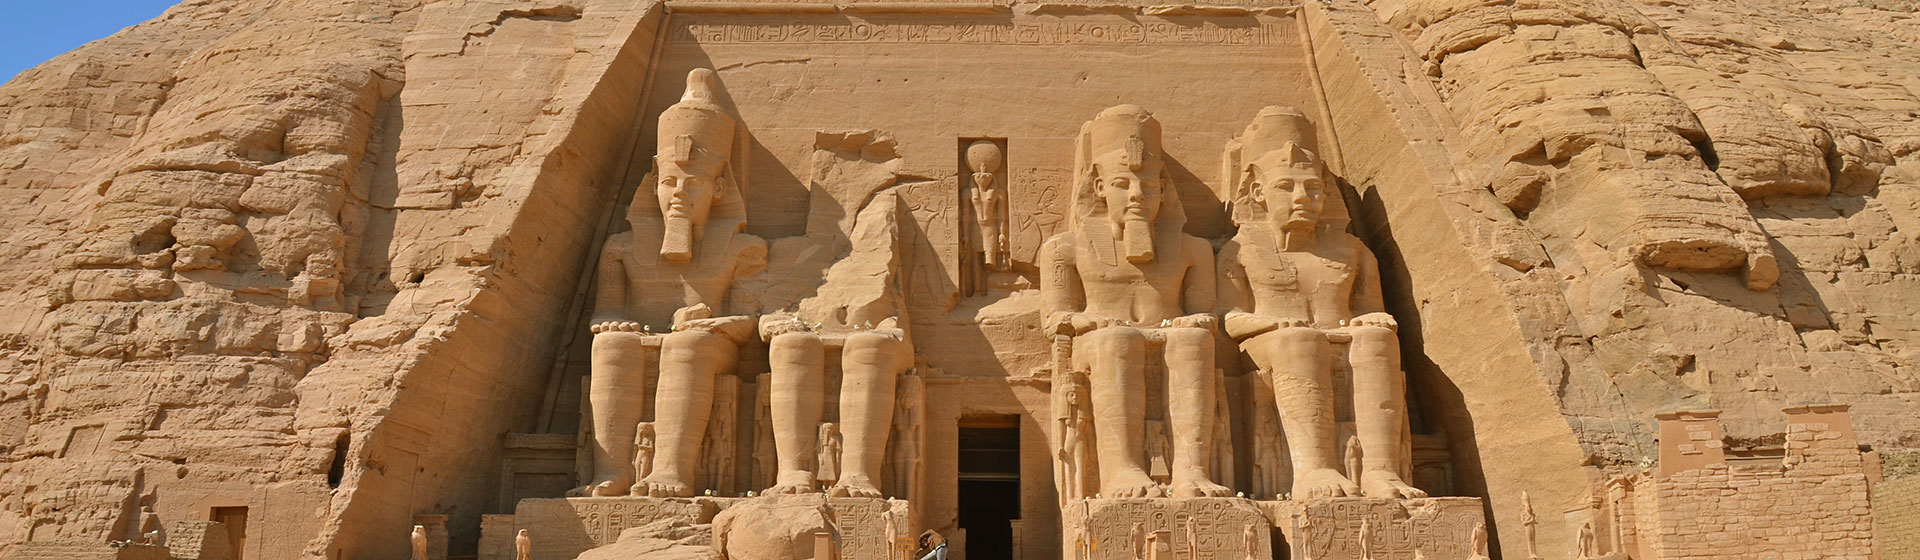 Leyendas De Abu Simbel